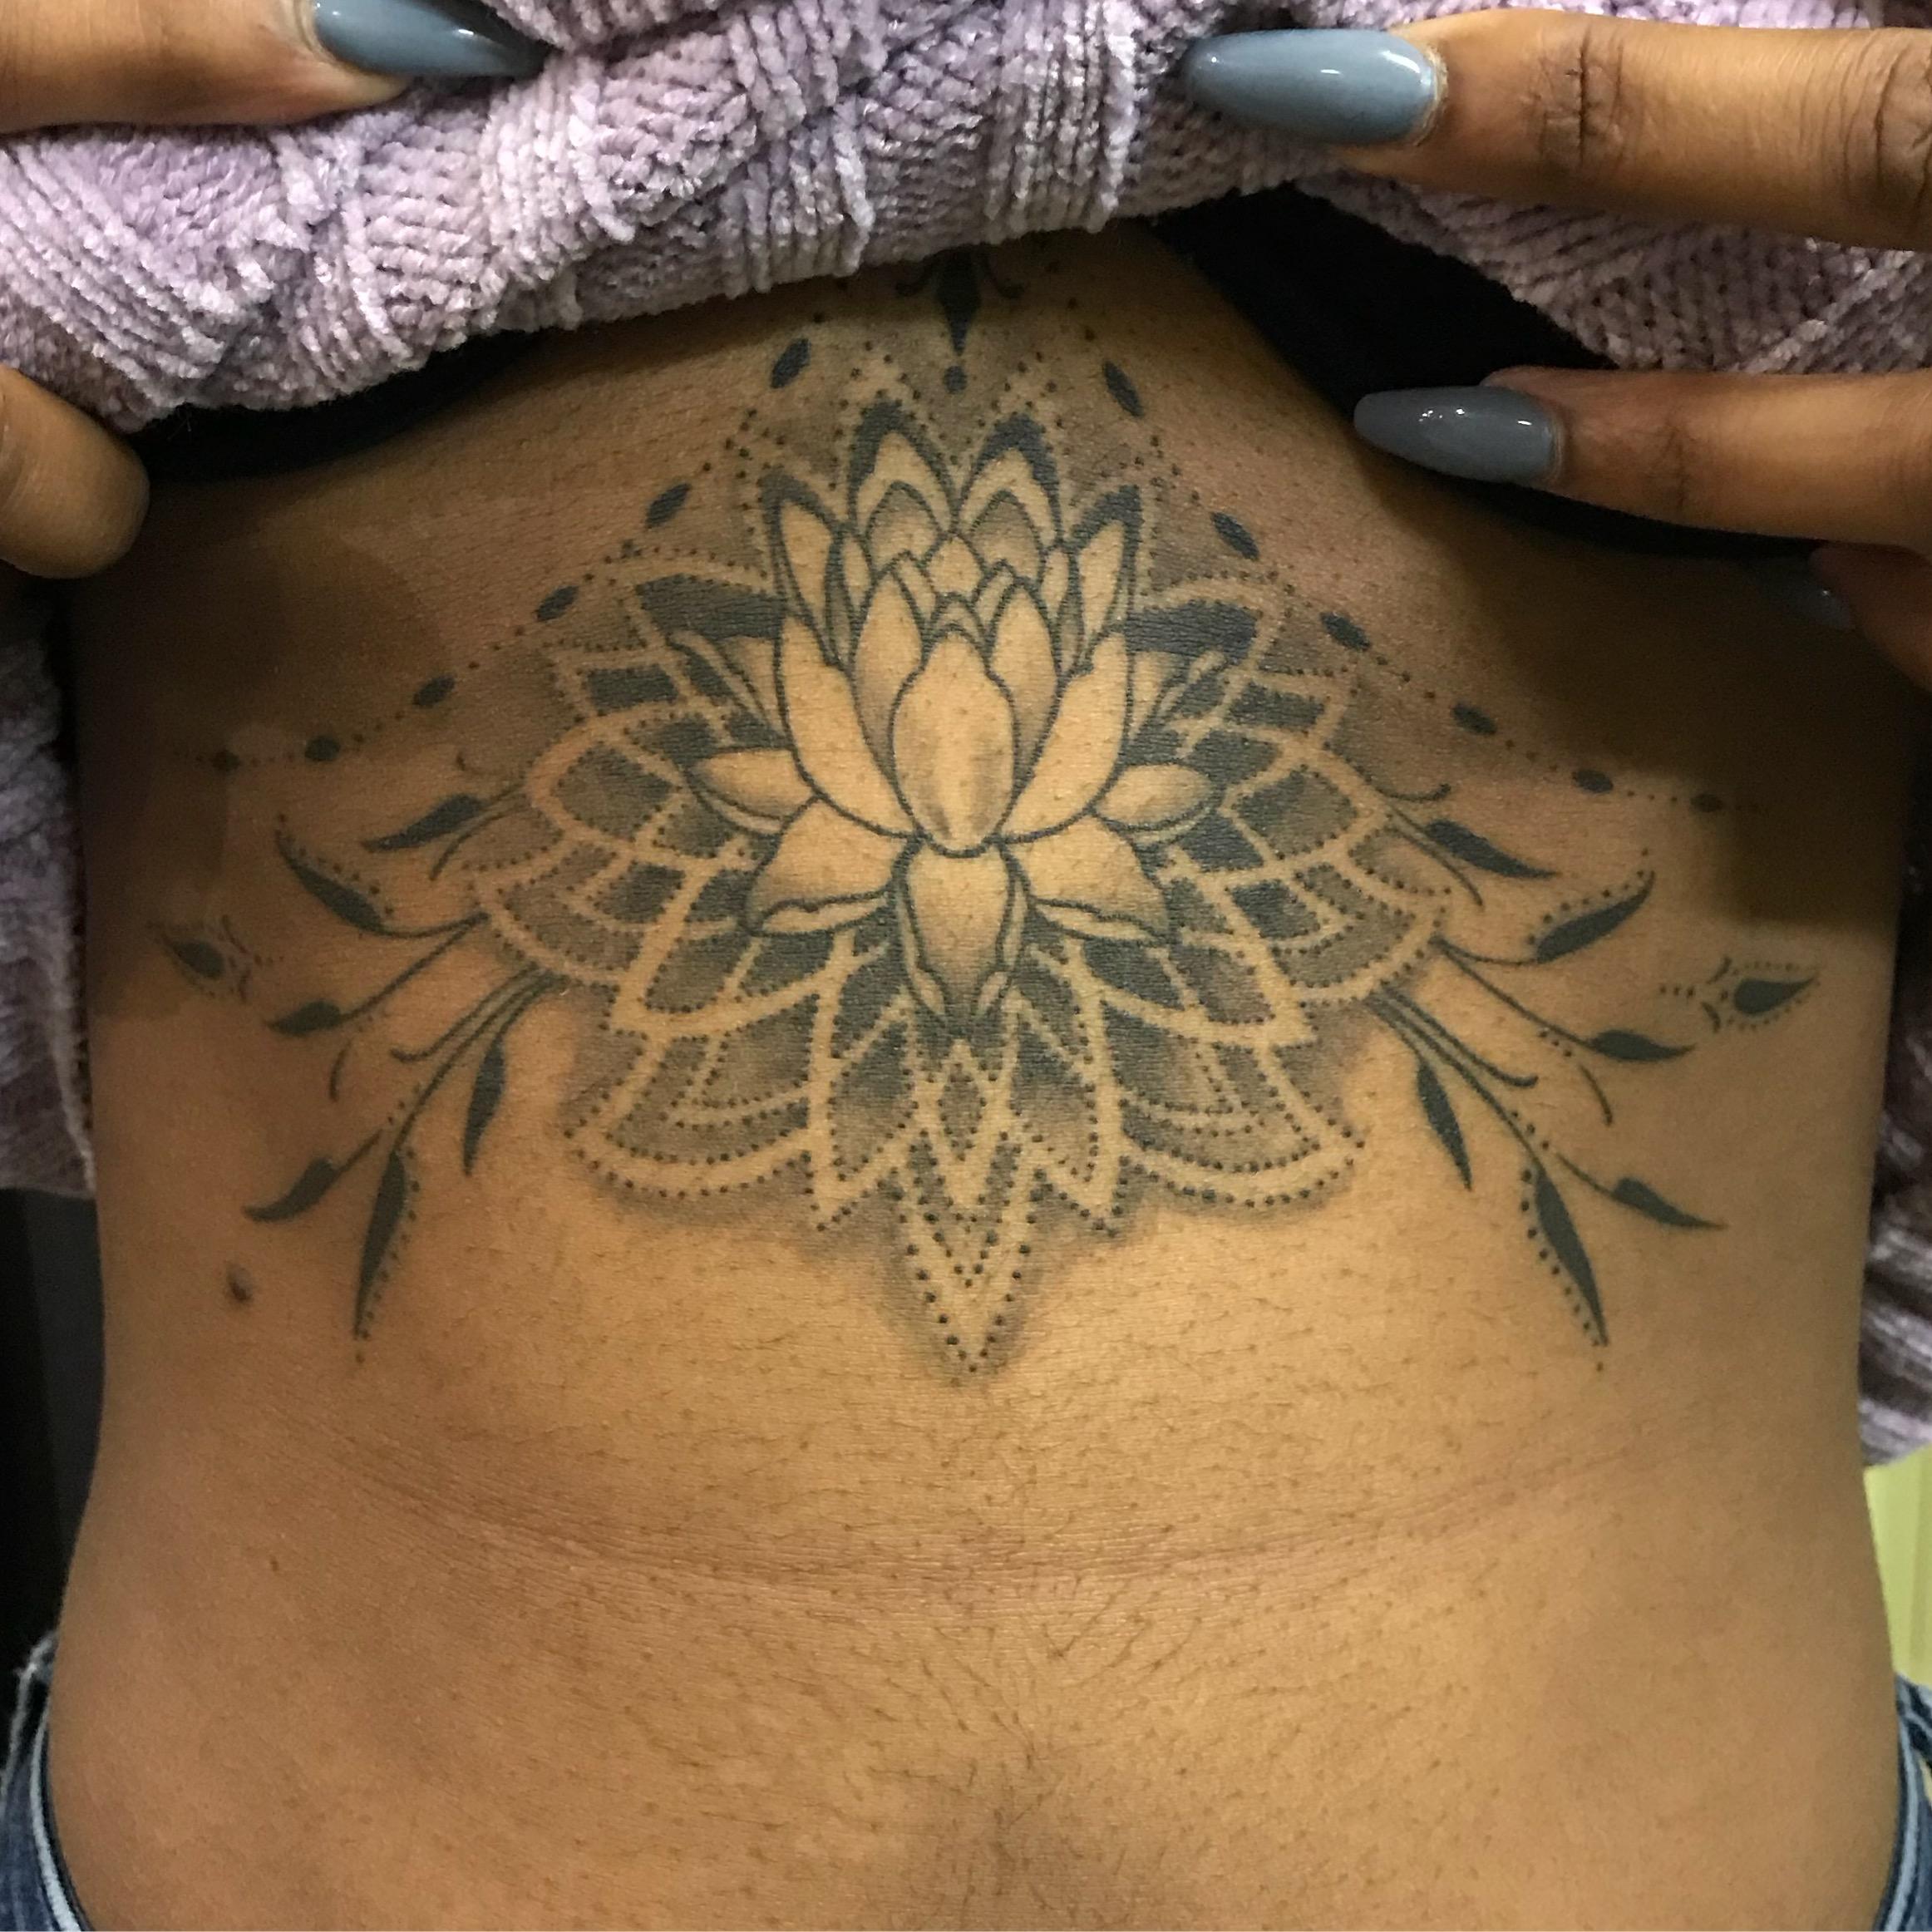 bg Justin Turkus Philadelphia fine line lettering best tattoo Artist lotus geometric sternum healed fullsize.jpg